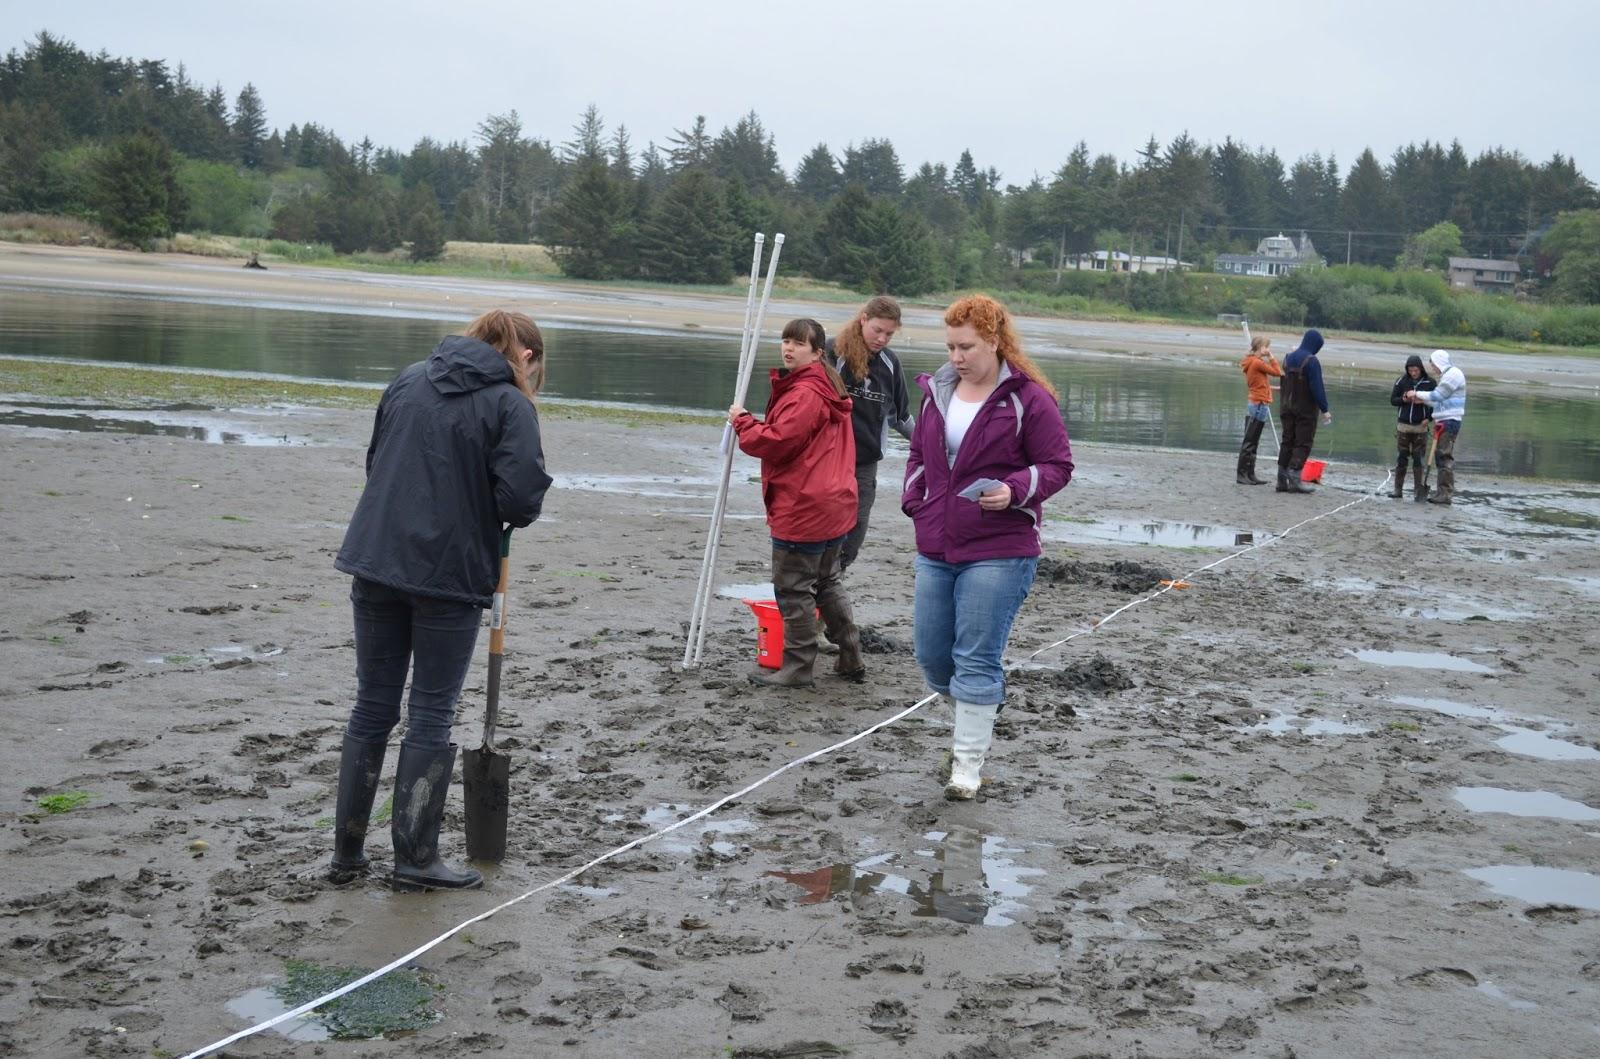 Byu Idaho Marine Biology Field Experience Day 7 Mud In